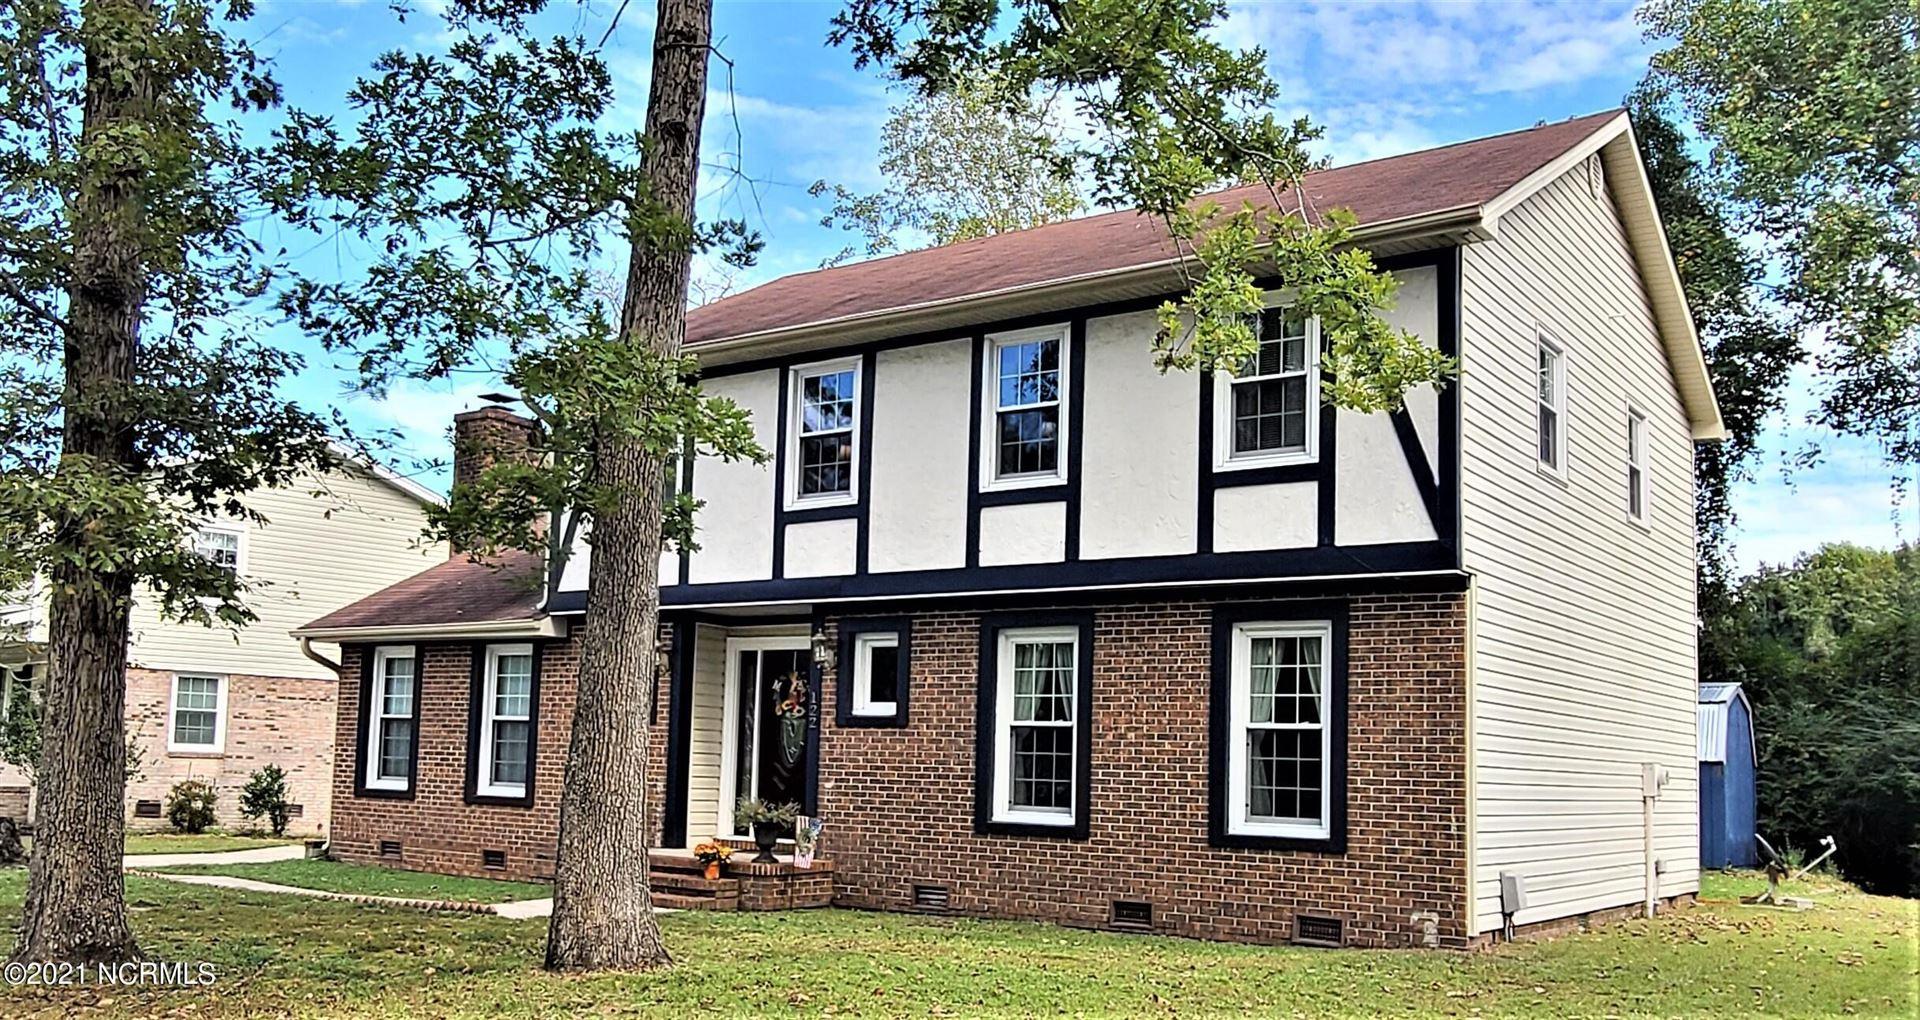 Photo of 122 King Richard Court, Jacksonville, NC 28546 (MLS # 100296169)